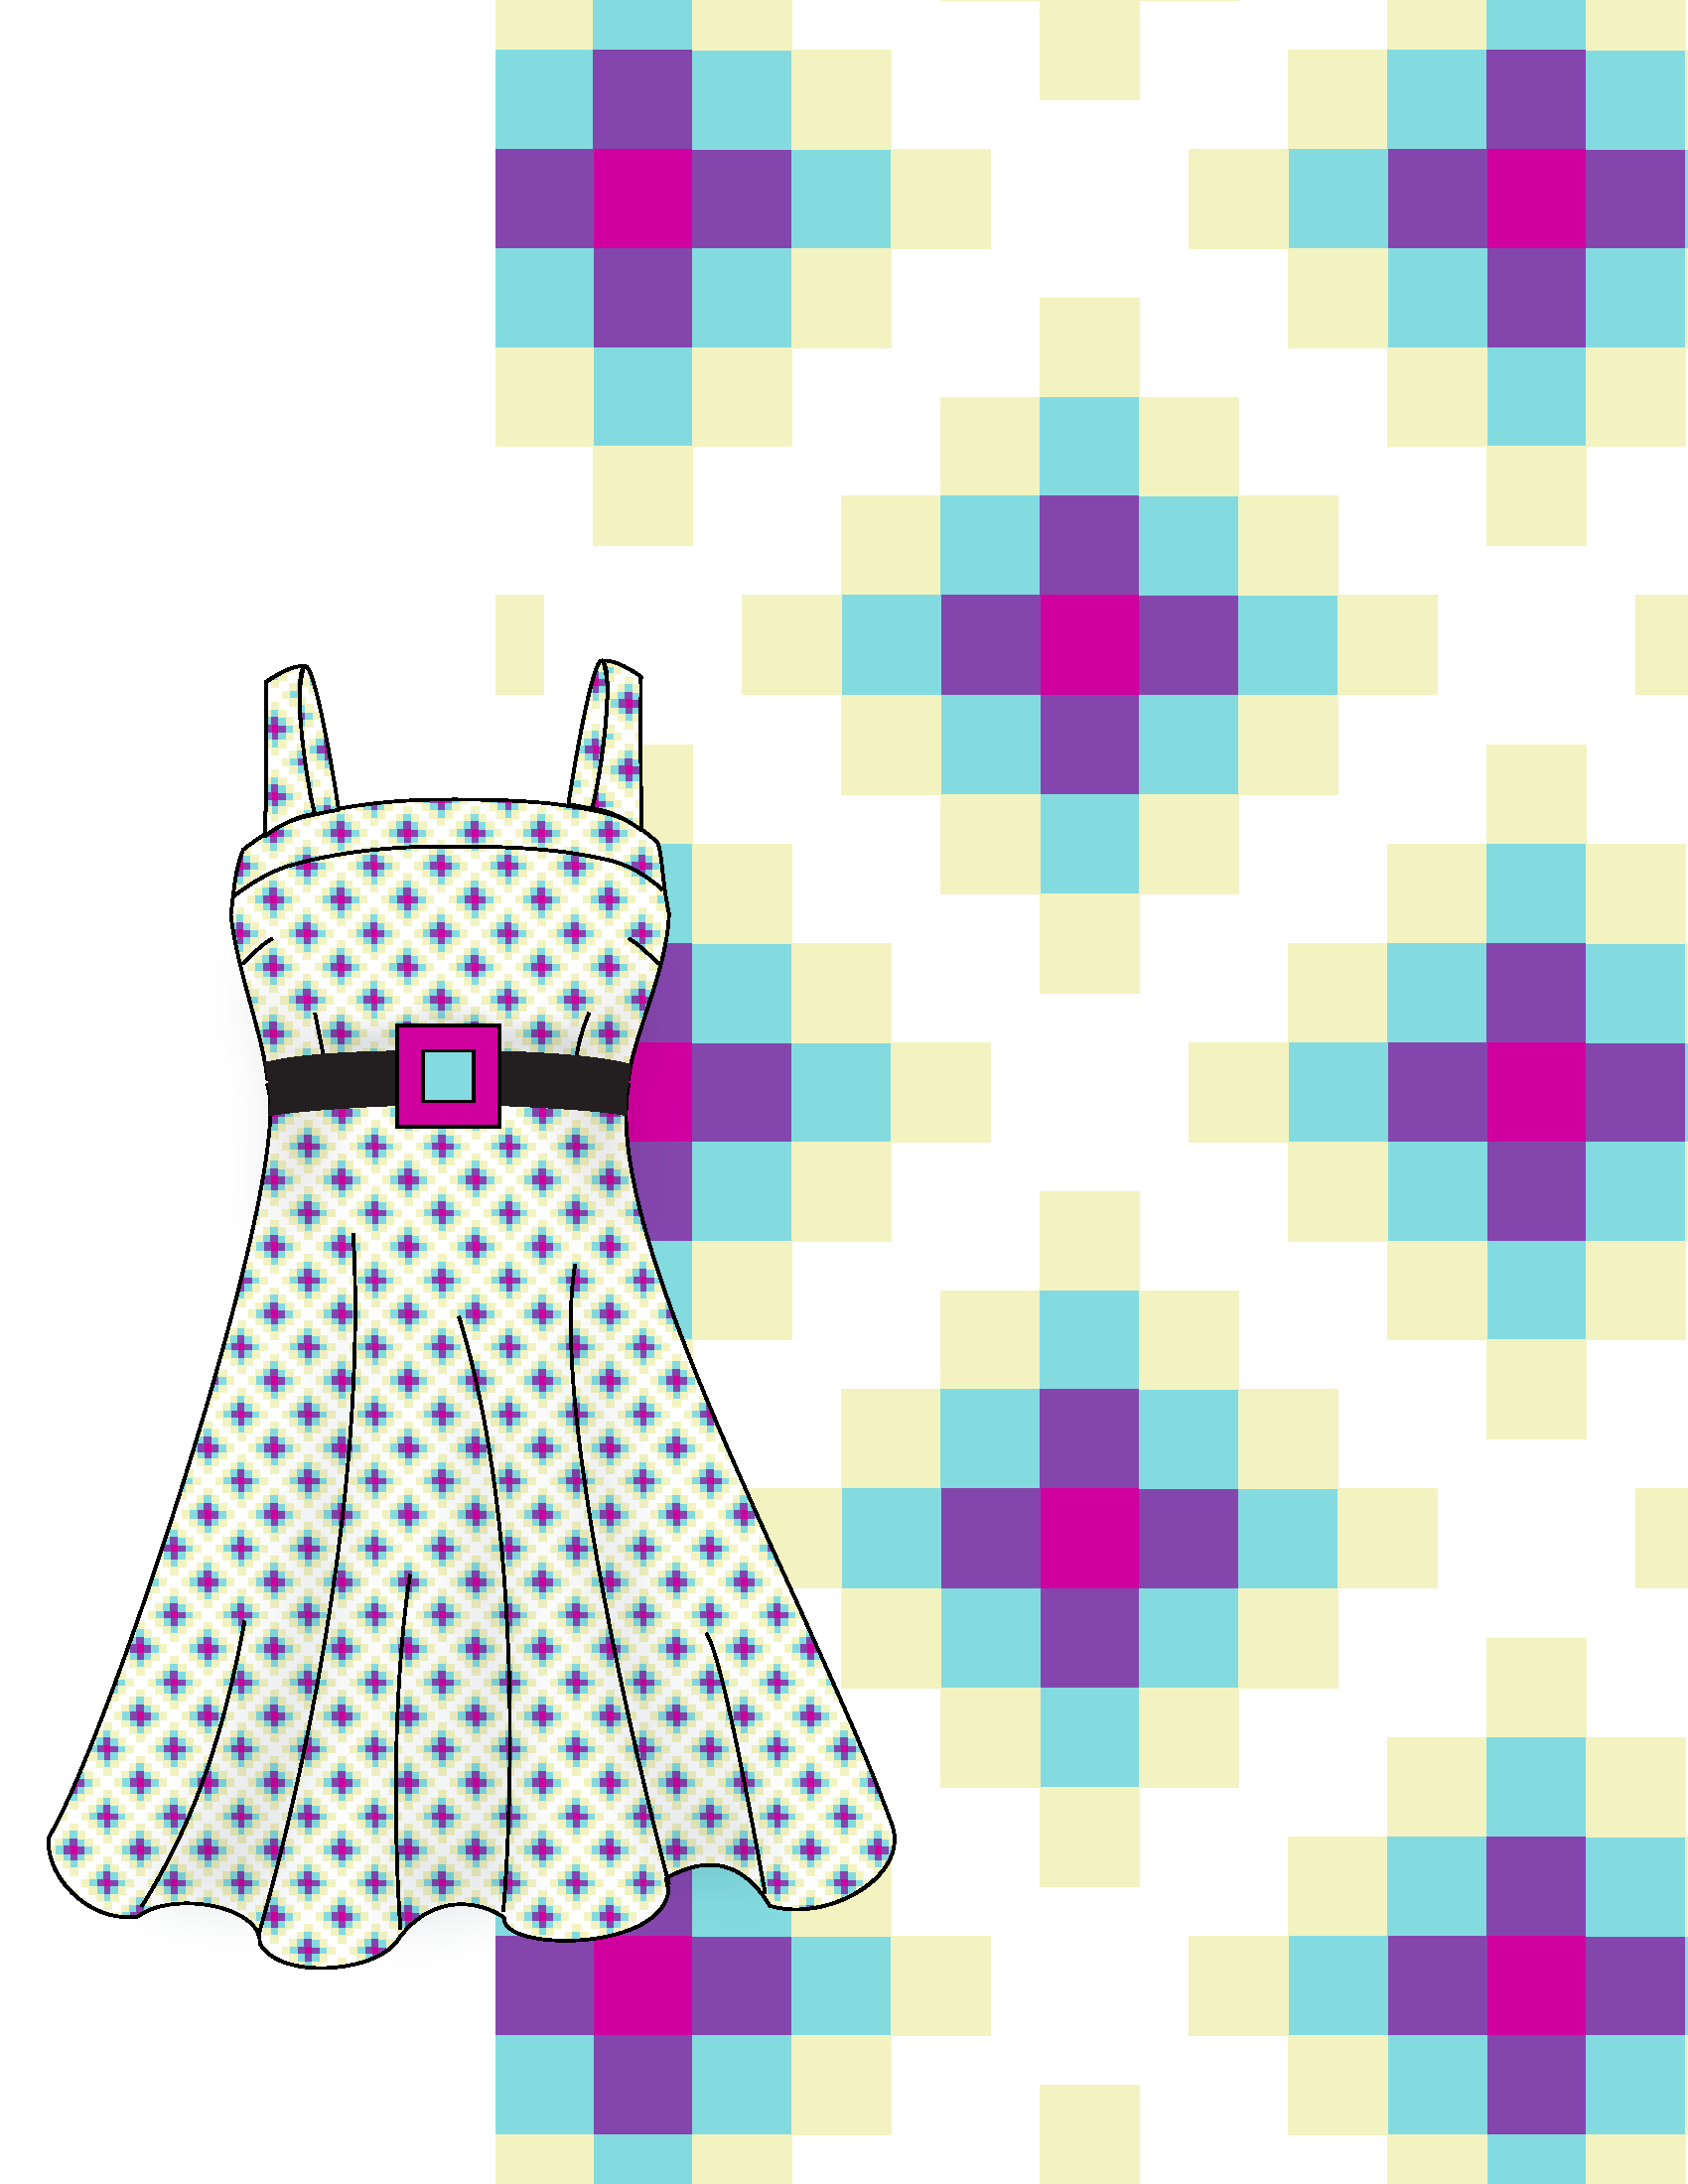 dress_cw3.png